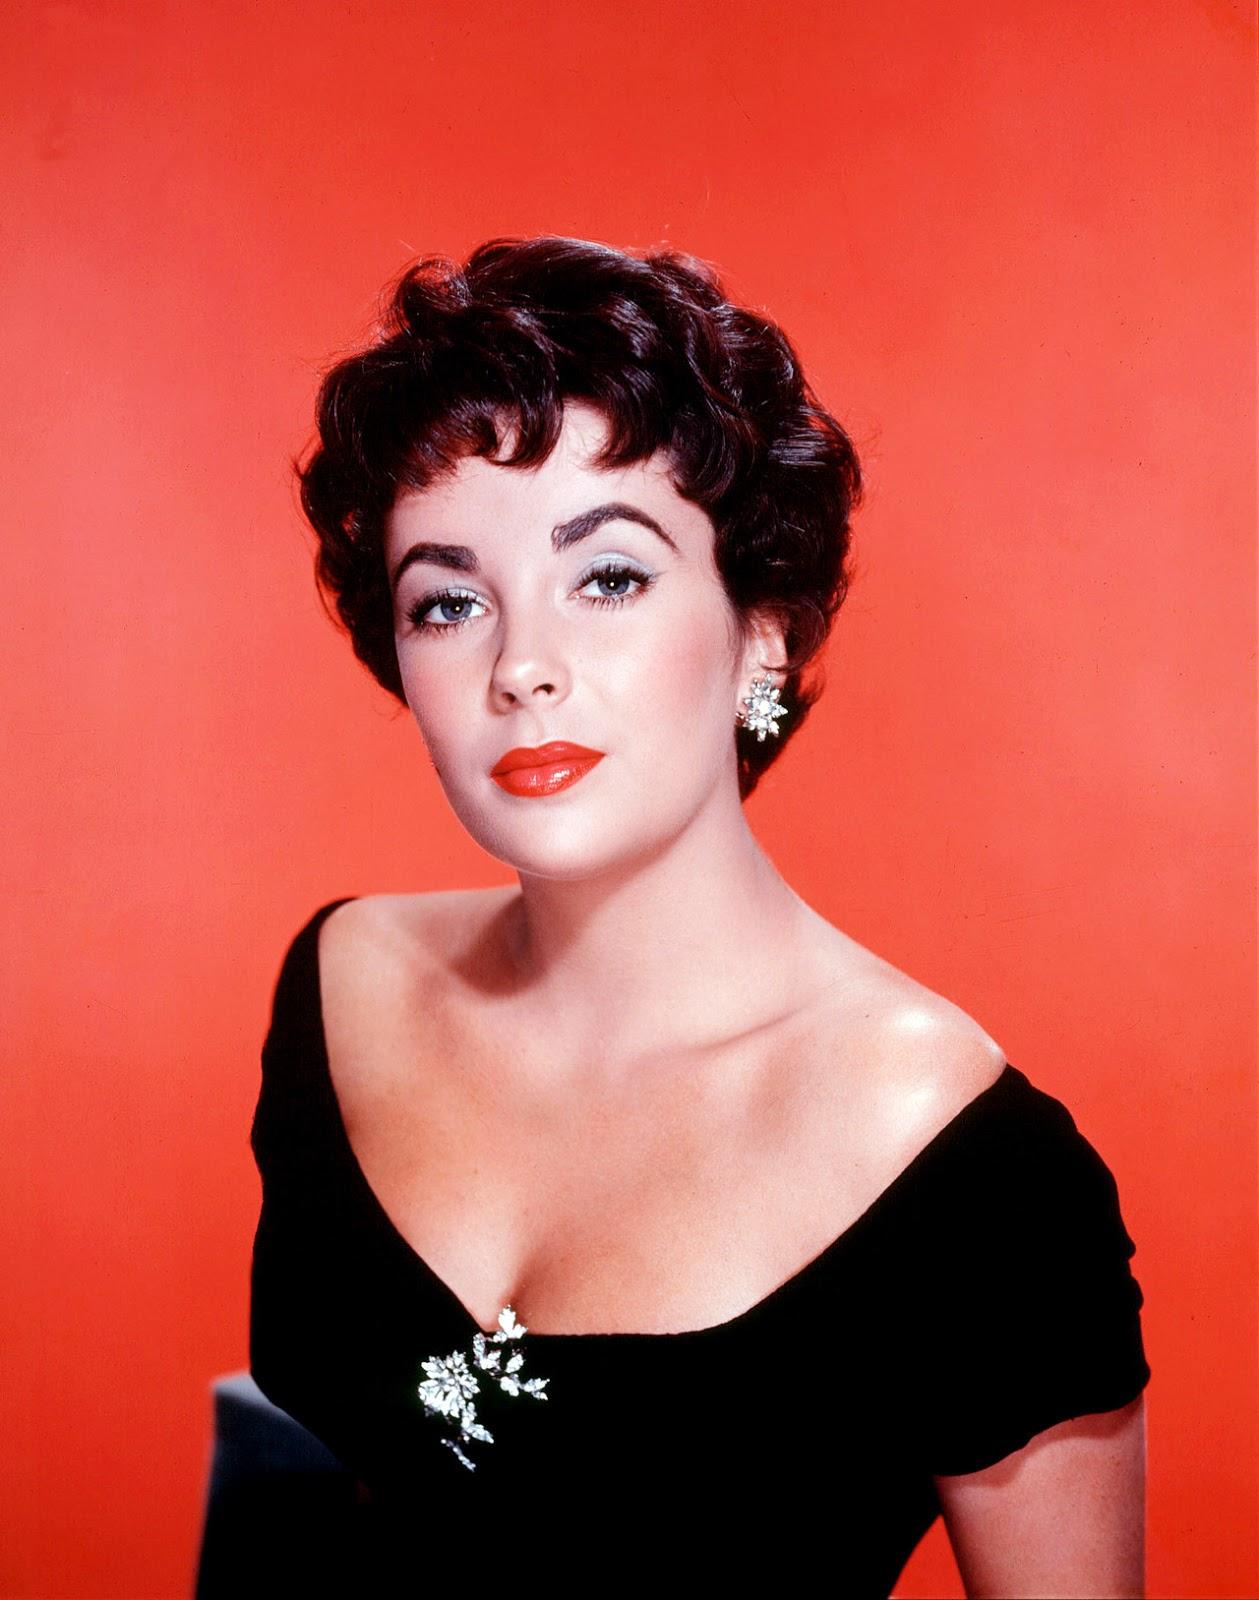 Elizabeth Taylor: Elizabeth Taylor's films in the Fifties